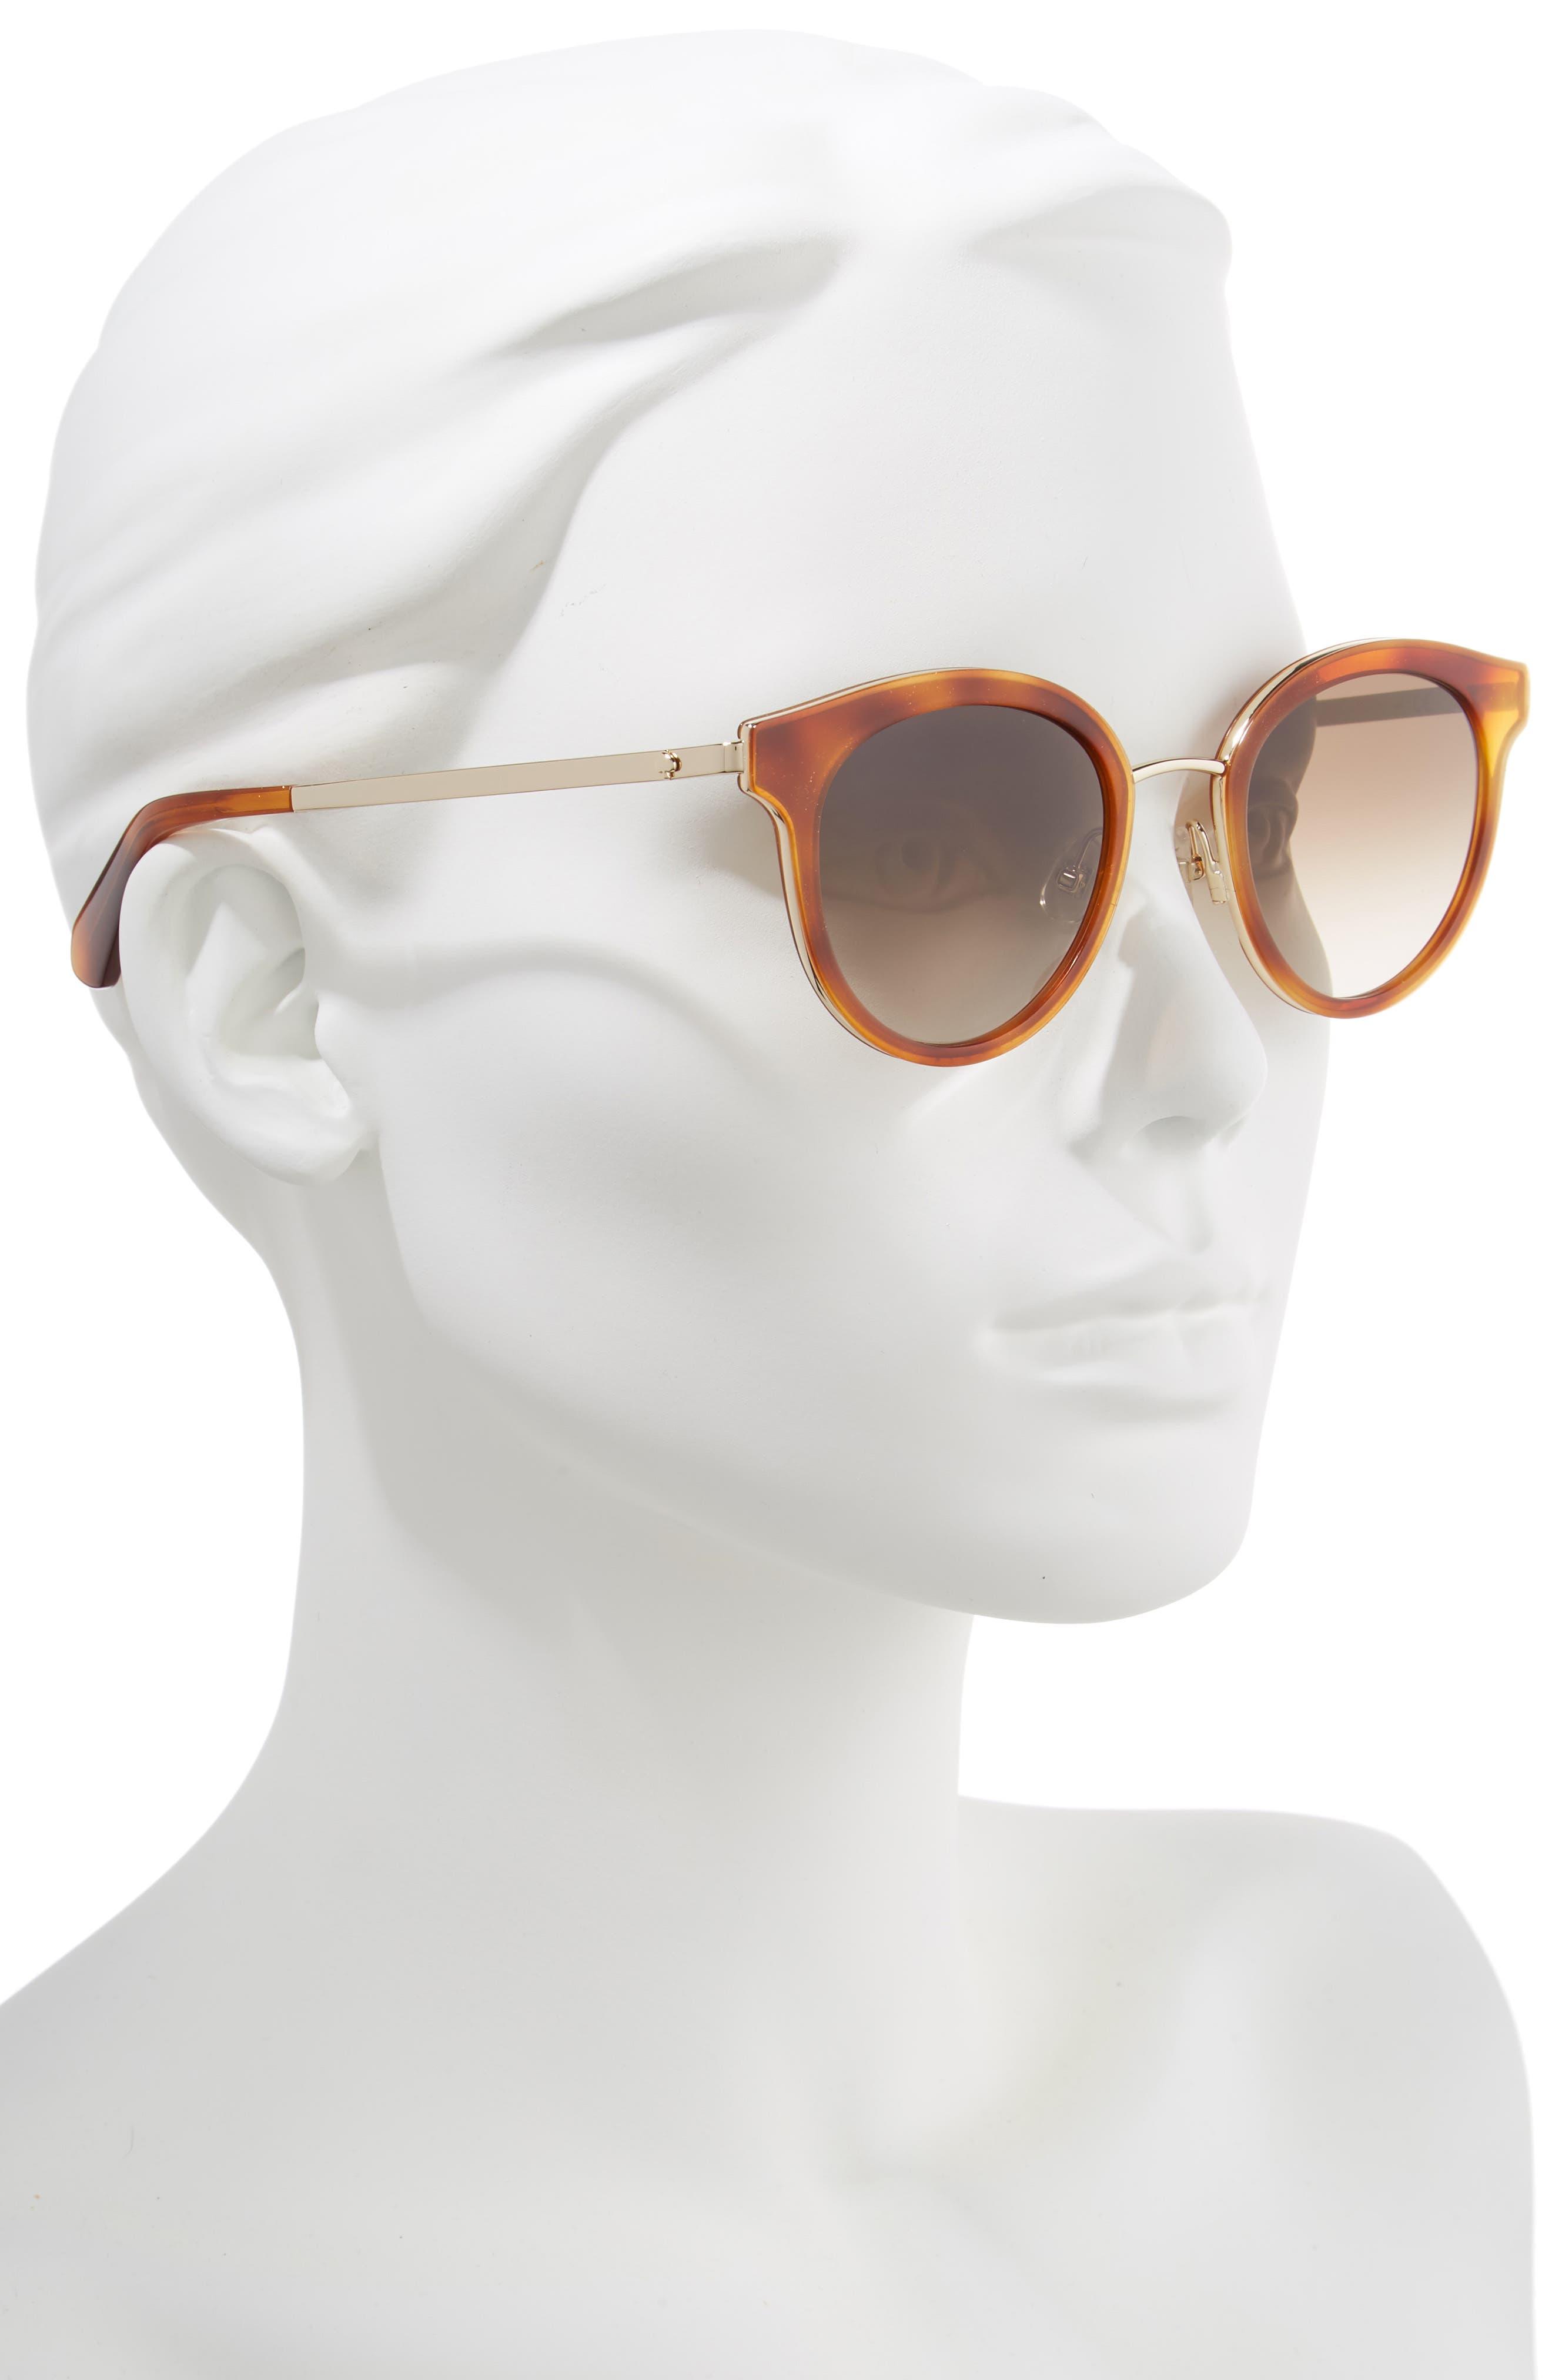 b52c86a89d8b5 Kate Spade New York Round Sunglasses for Women